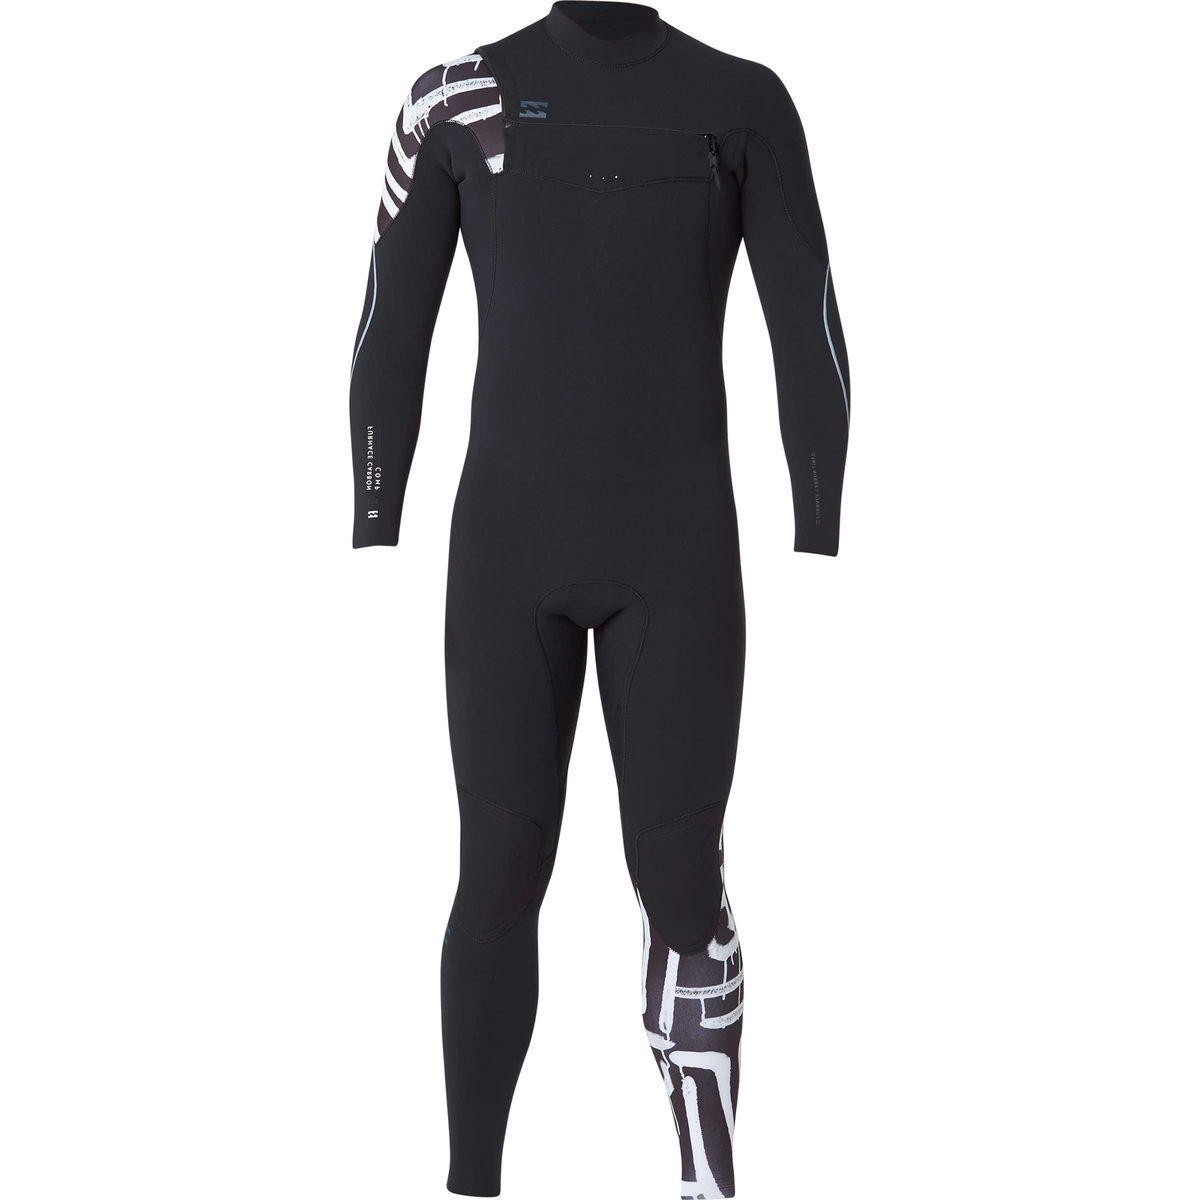 Billabong 3/2 Furnace Carbon Comp Chest Zip Full Wetsuit - Men's